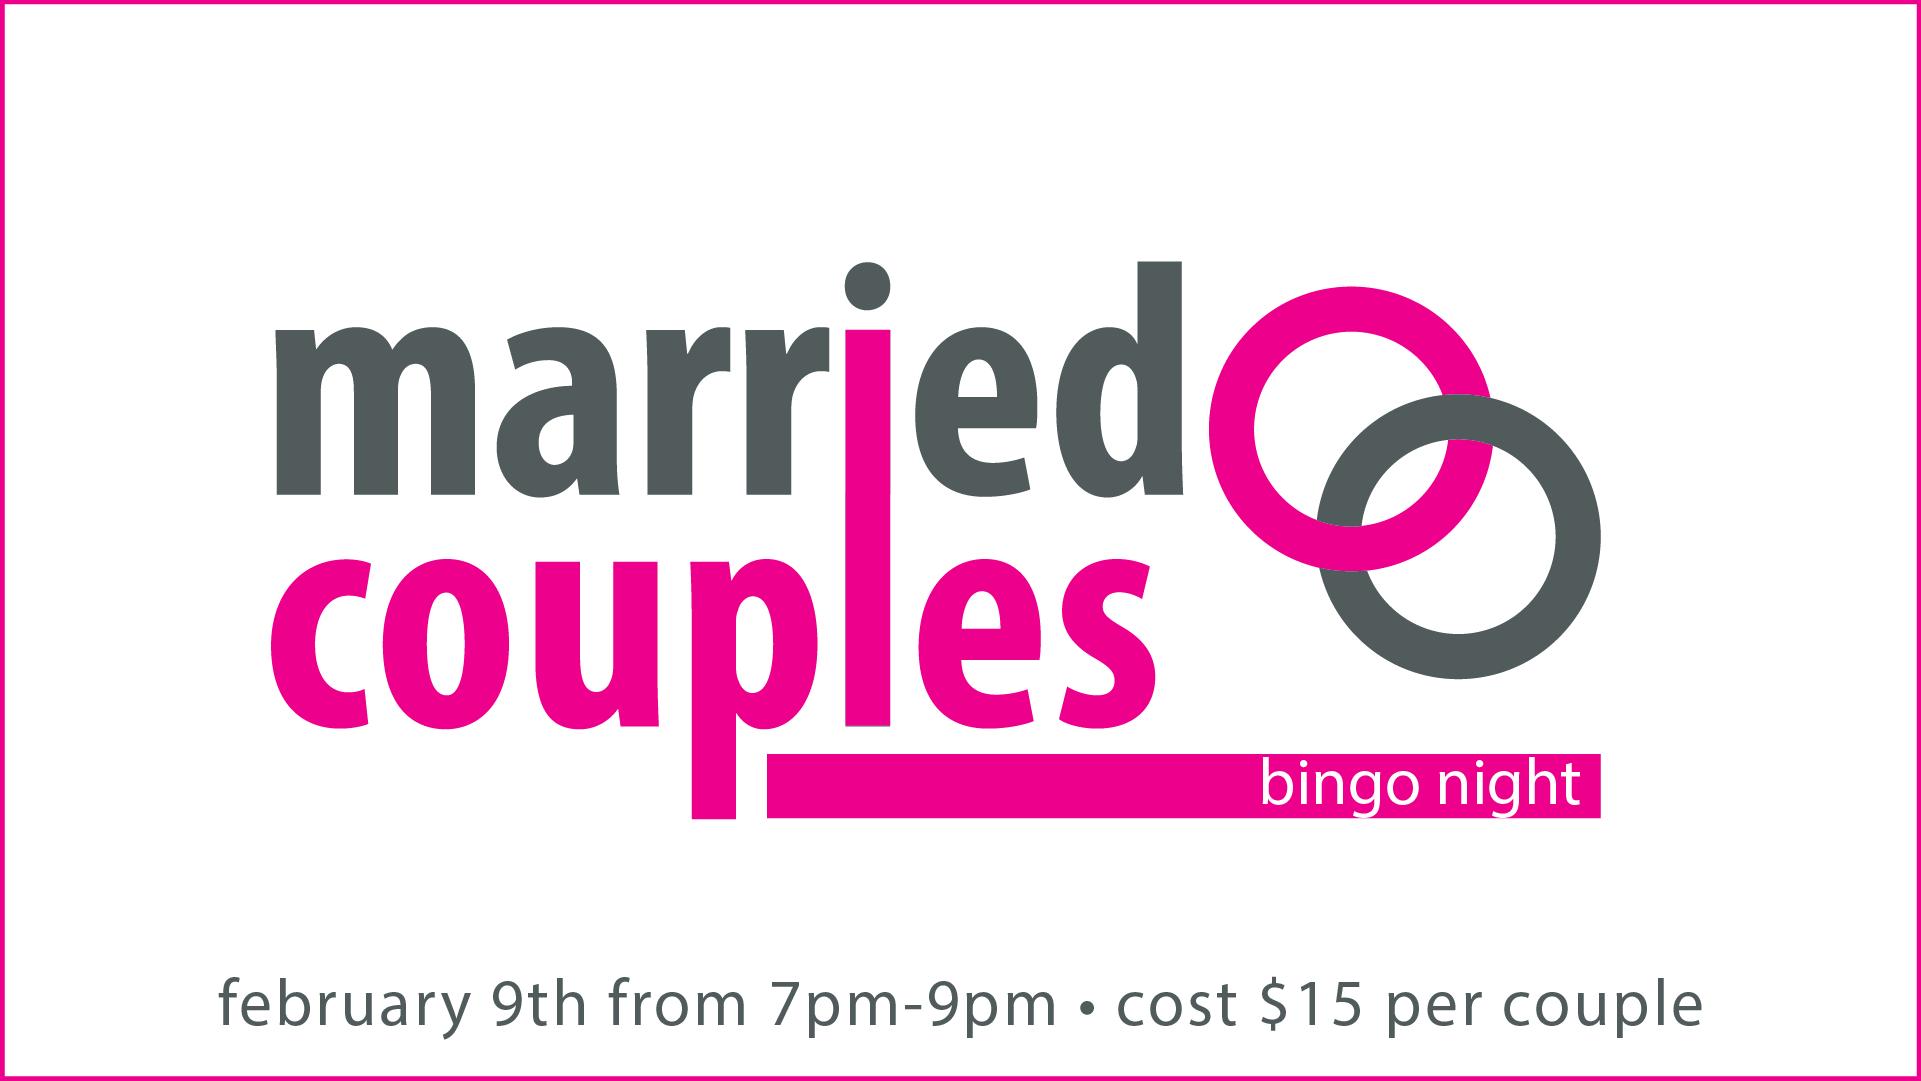 Marriage_Bingo_Night_WEB_V1.jpg